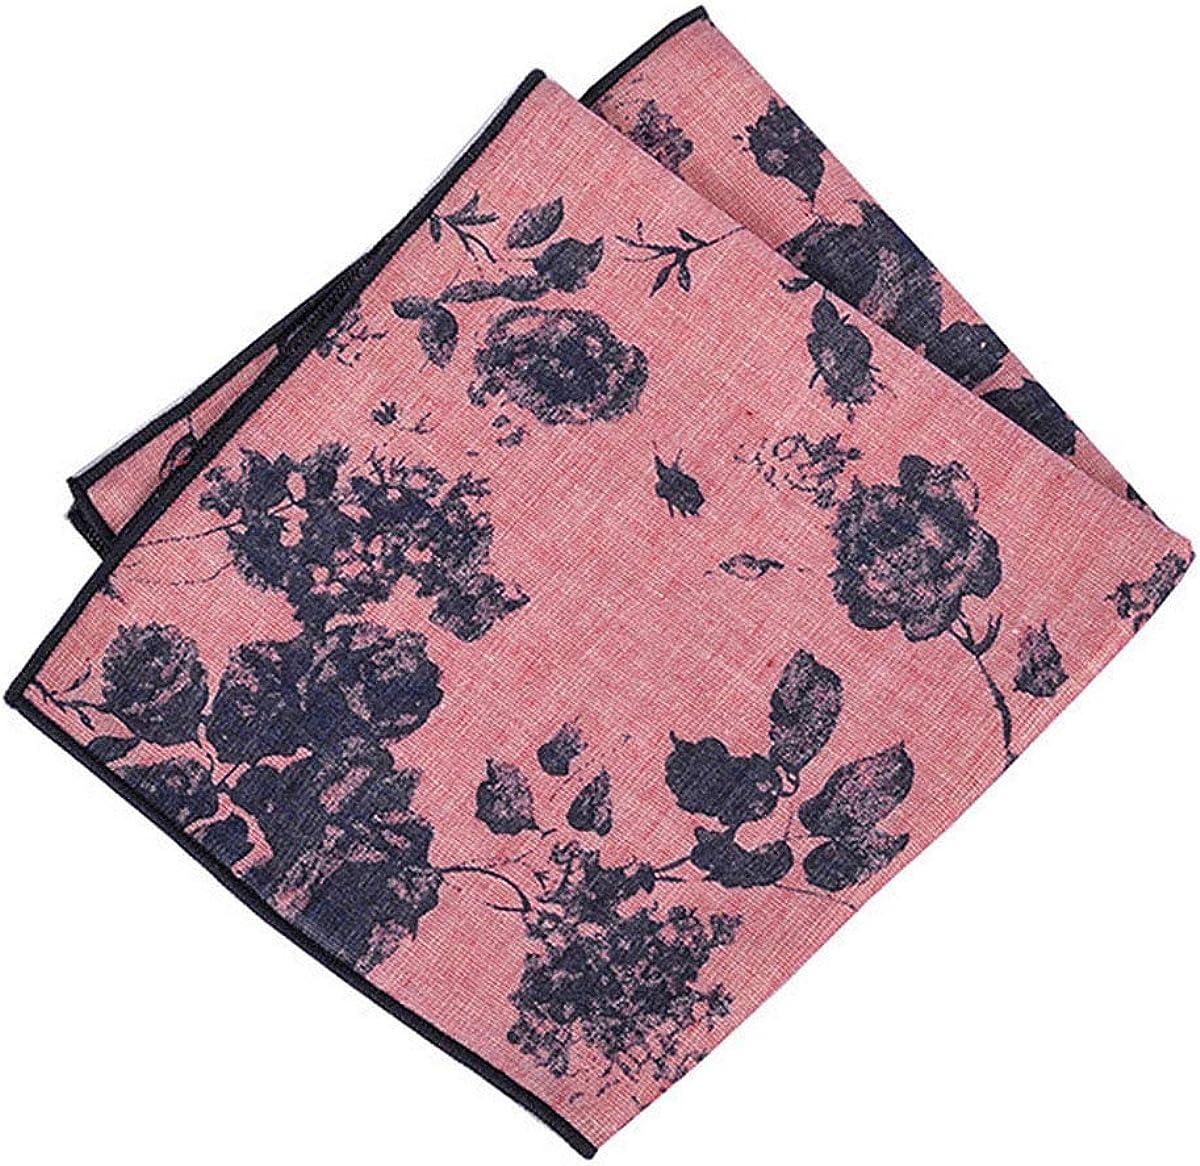 Packs Men's 100% Cotton Retro Printed Handkerchiefs for Casual Business